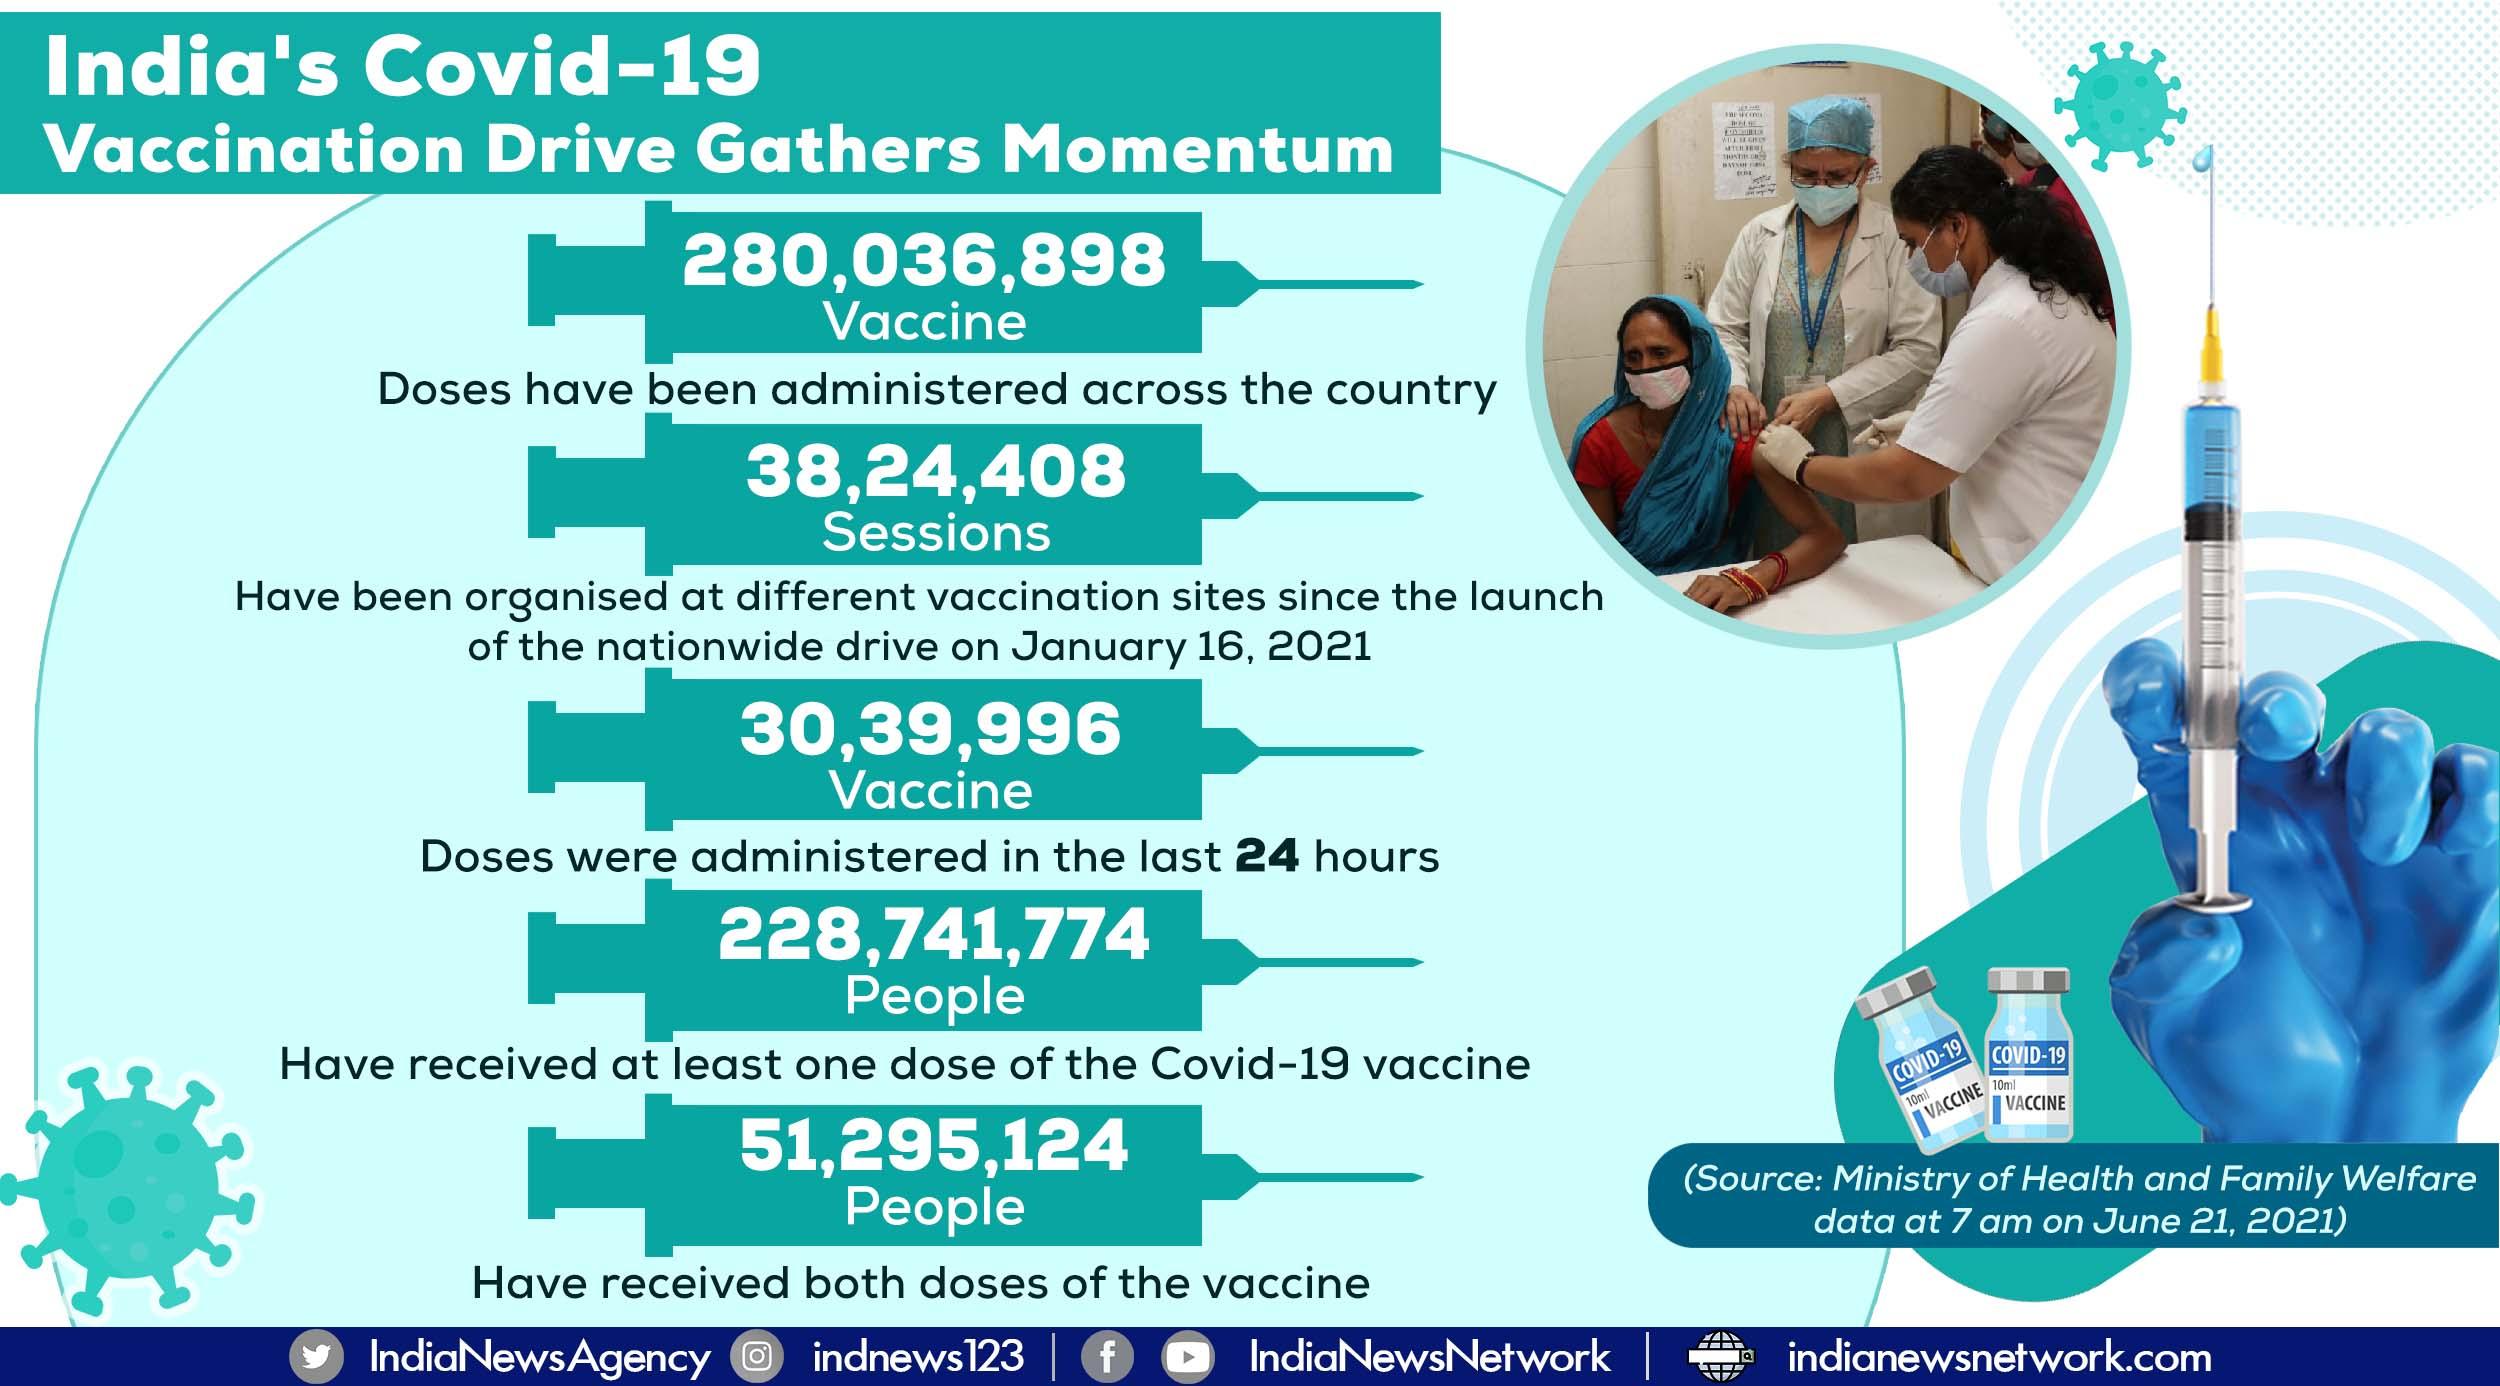 India's Covid-19 vaccination coverage crosses landmark of 280 million